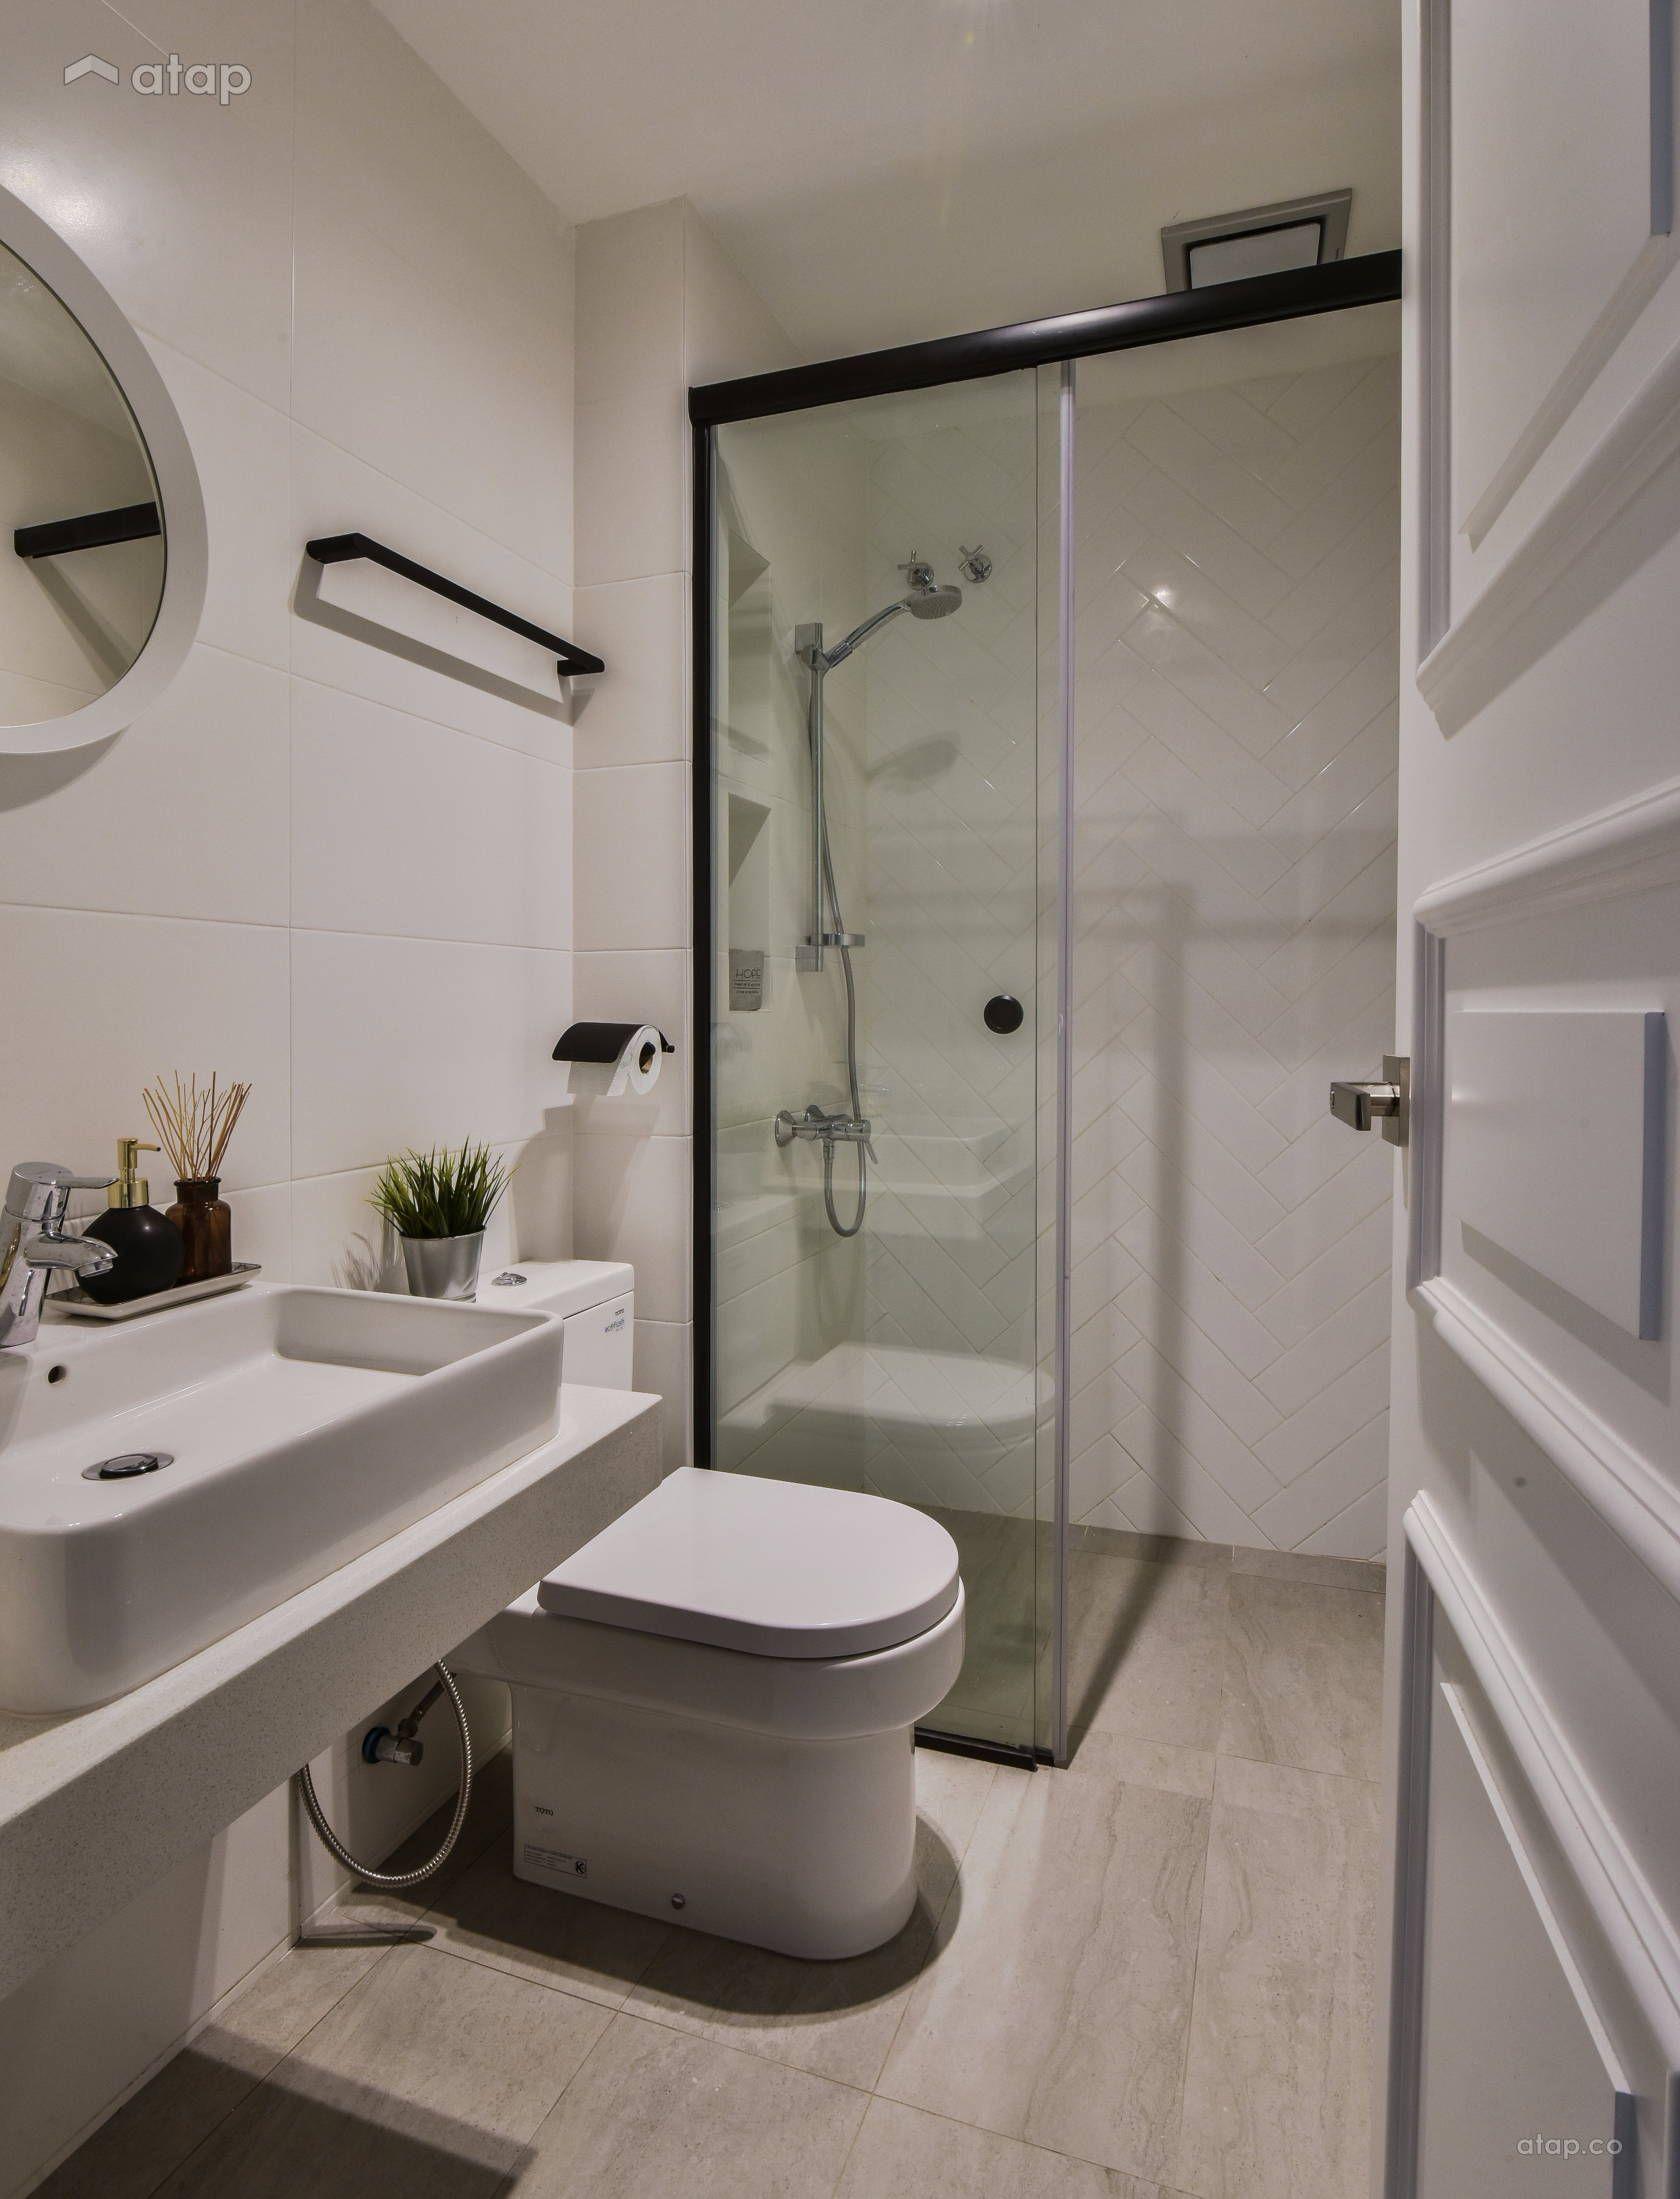 Minimalistic Scandinavian Bathroom Terrace Design Ideas Photos Malaysia Atap Co Bathroomdesi Bathroom Remodel Cost Small Bathroom Design Bathrooms Remodel